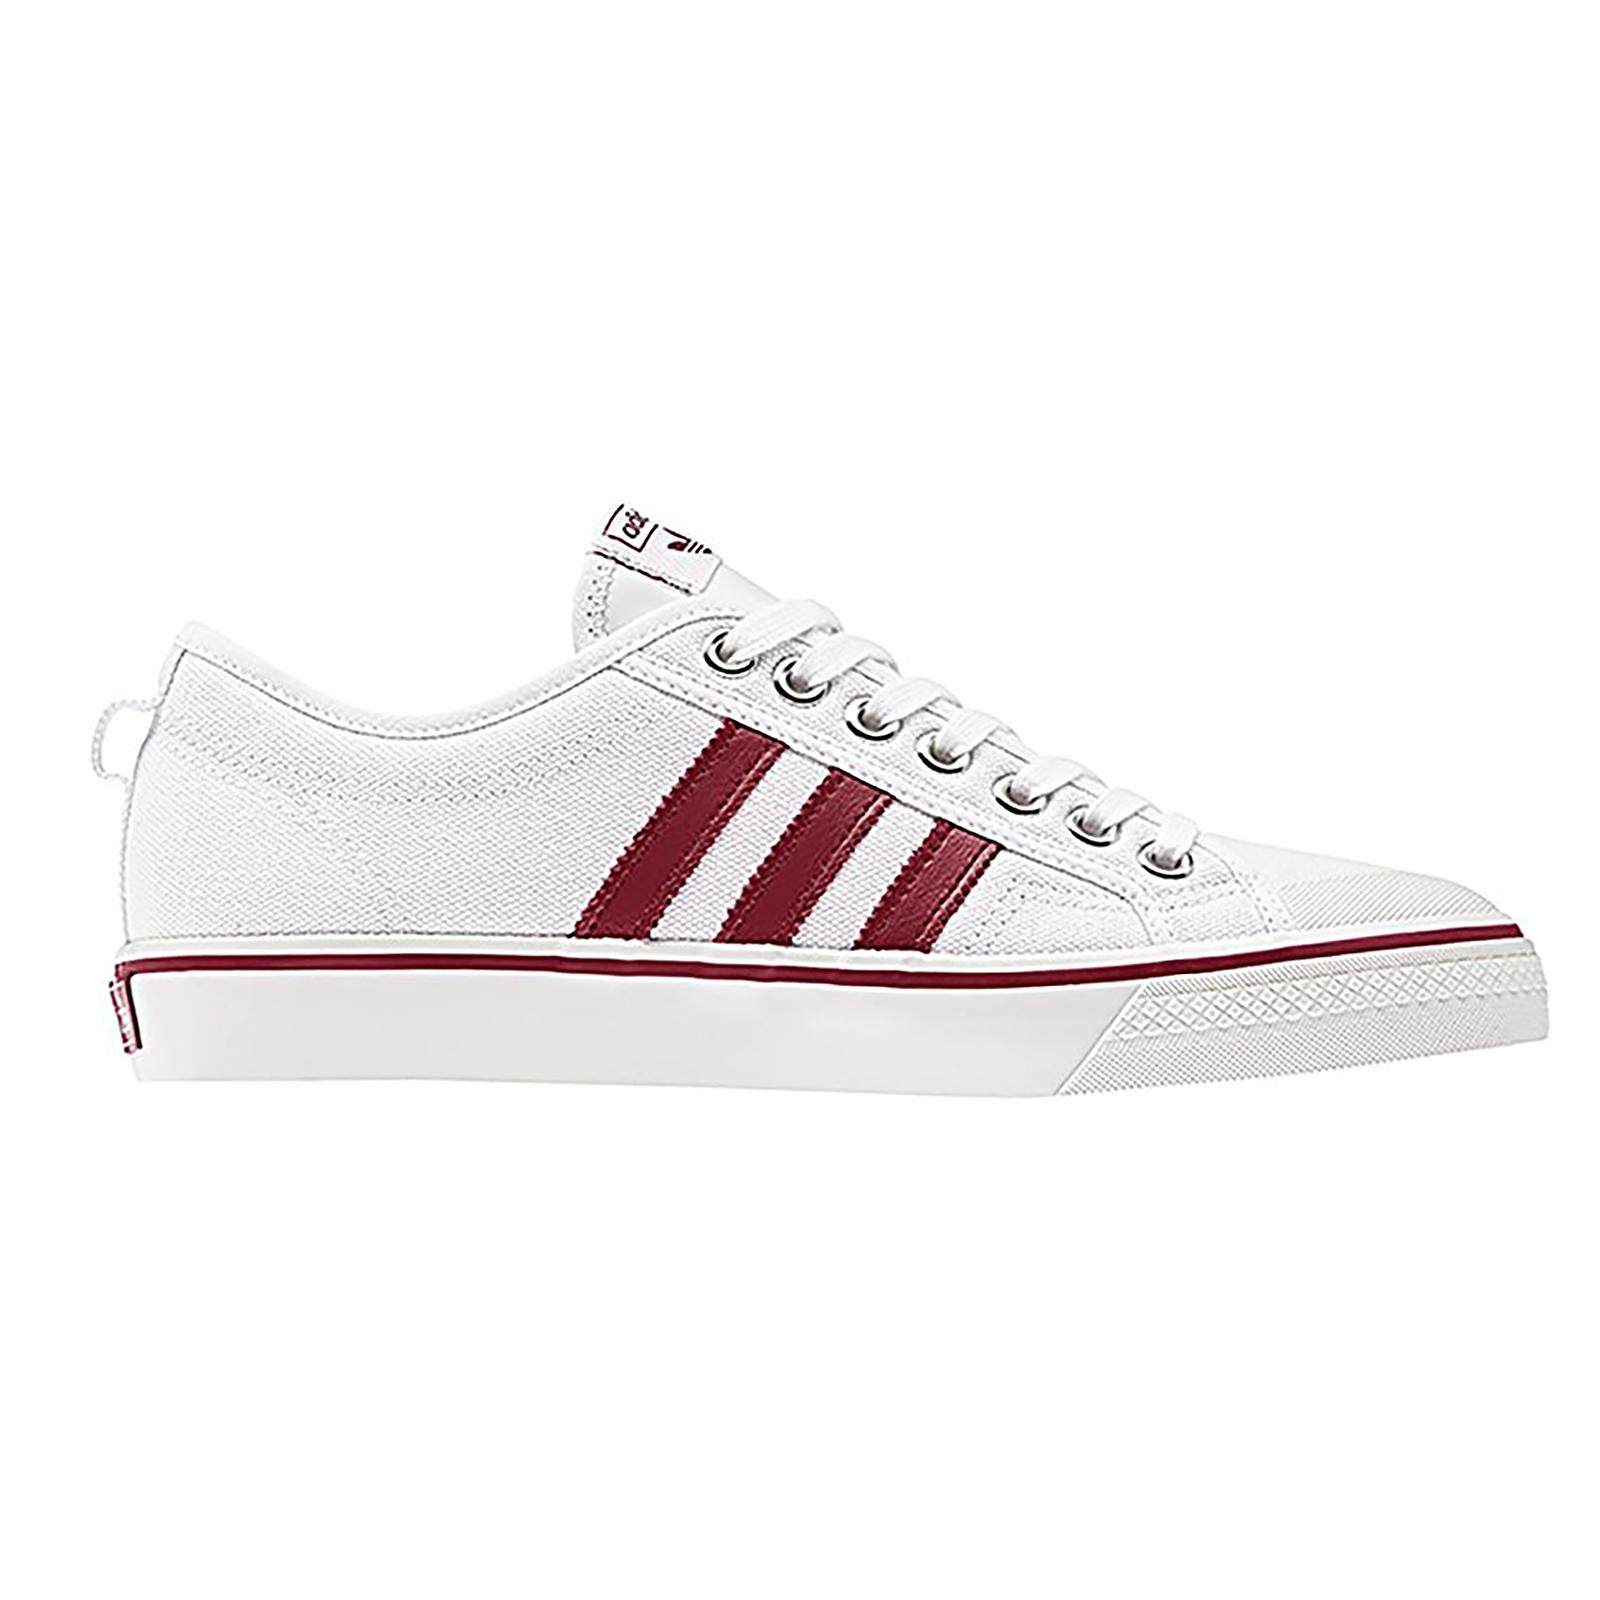 Adidas Burgundy Sneakers Nizza Blanco / Burgundy Adidas Bianco 60f613